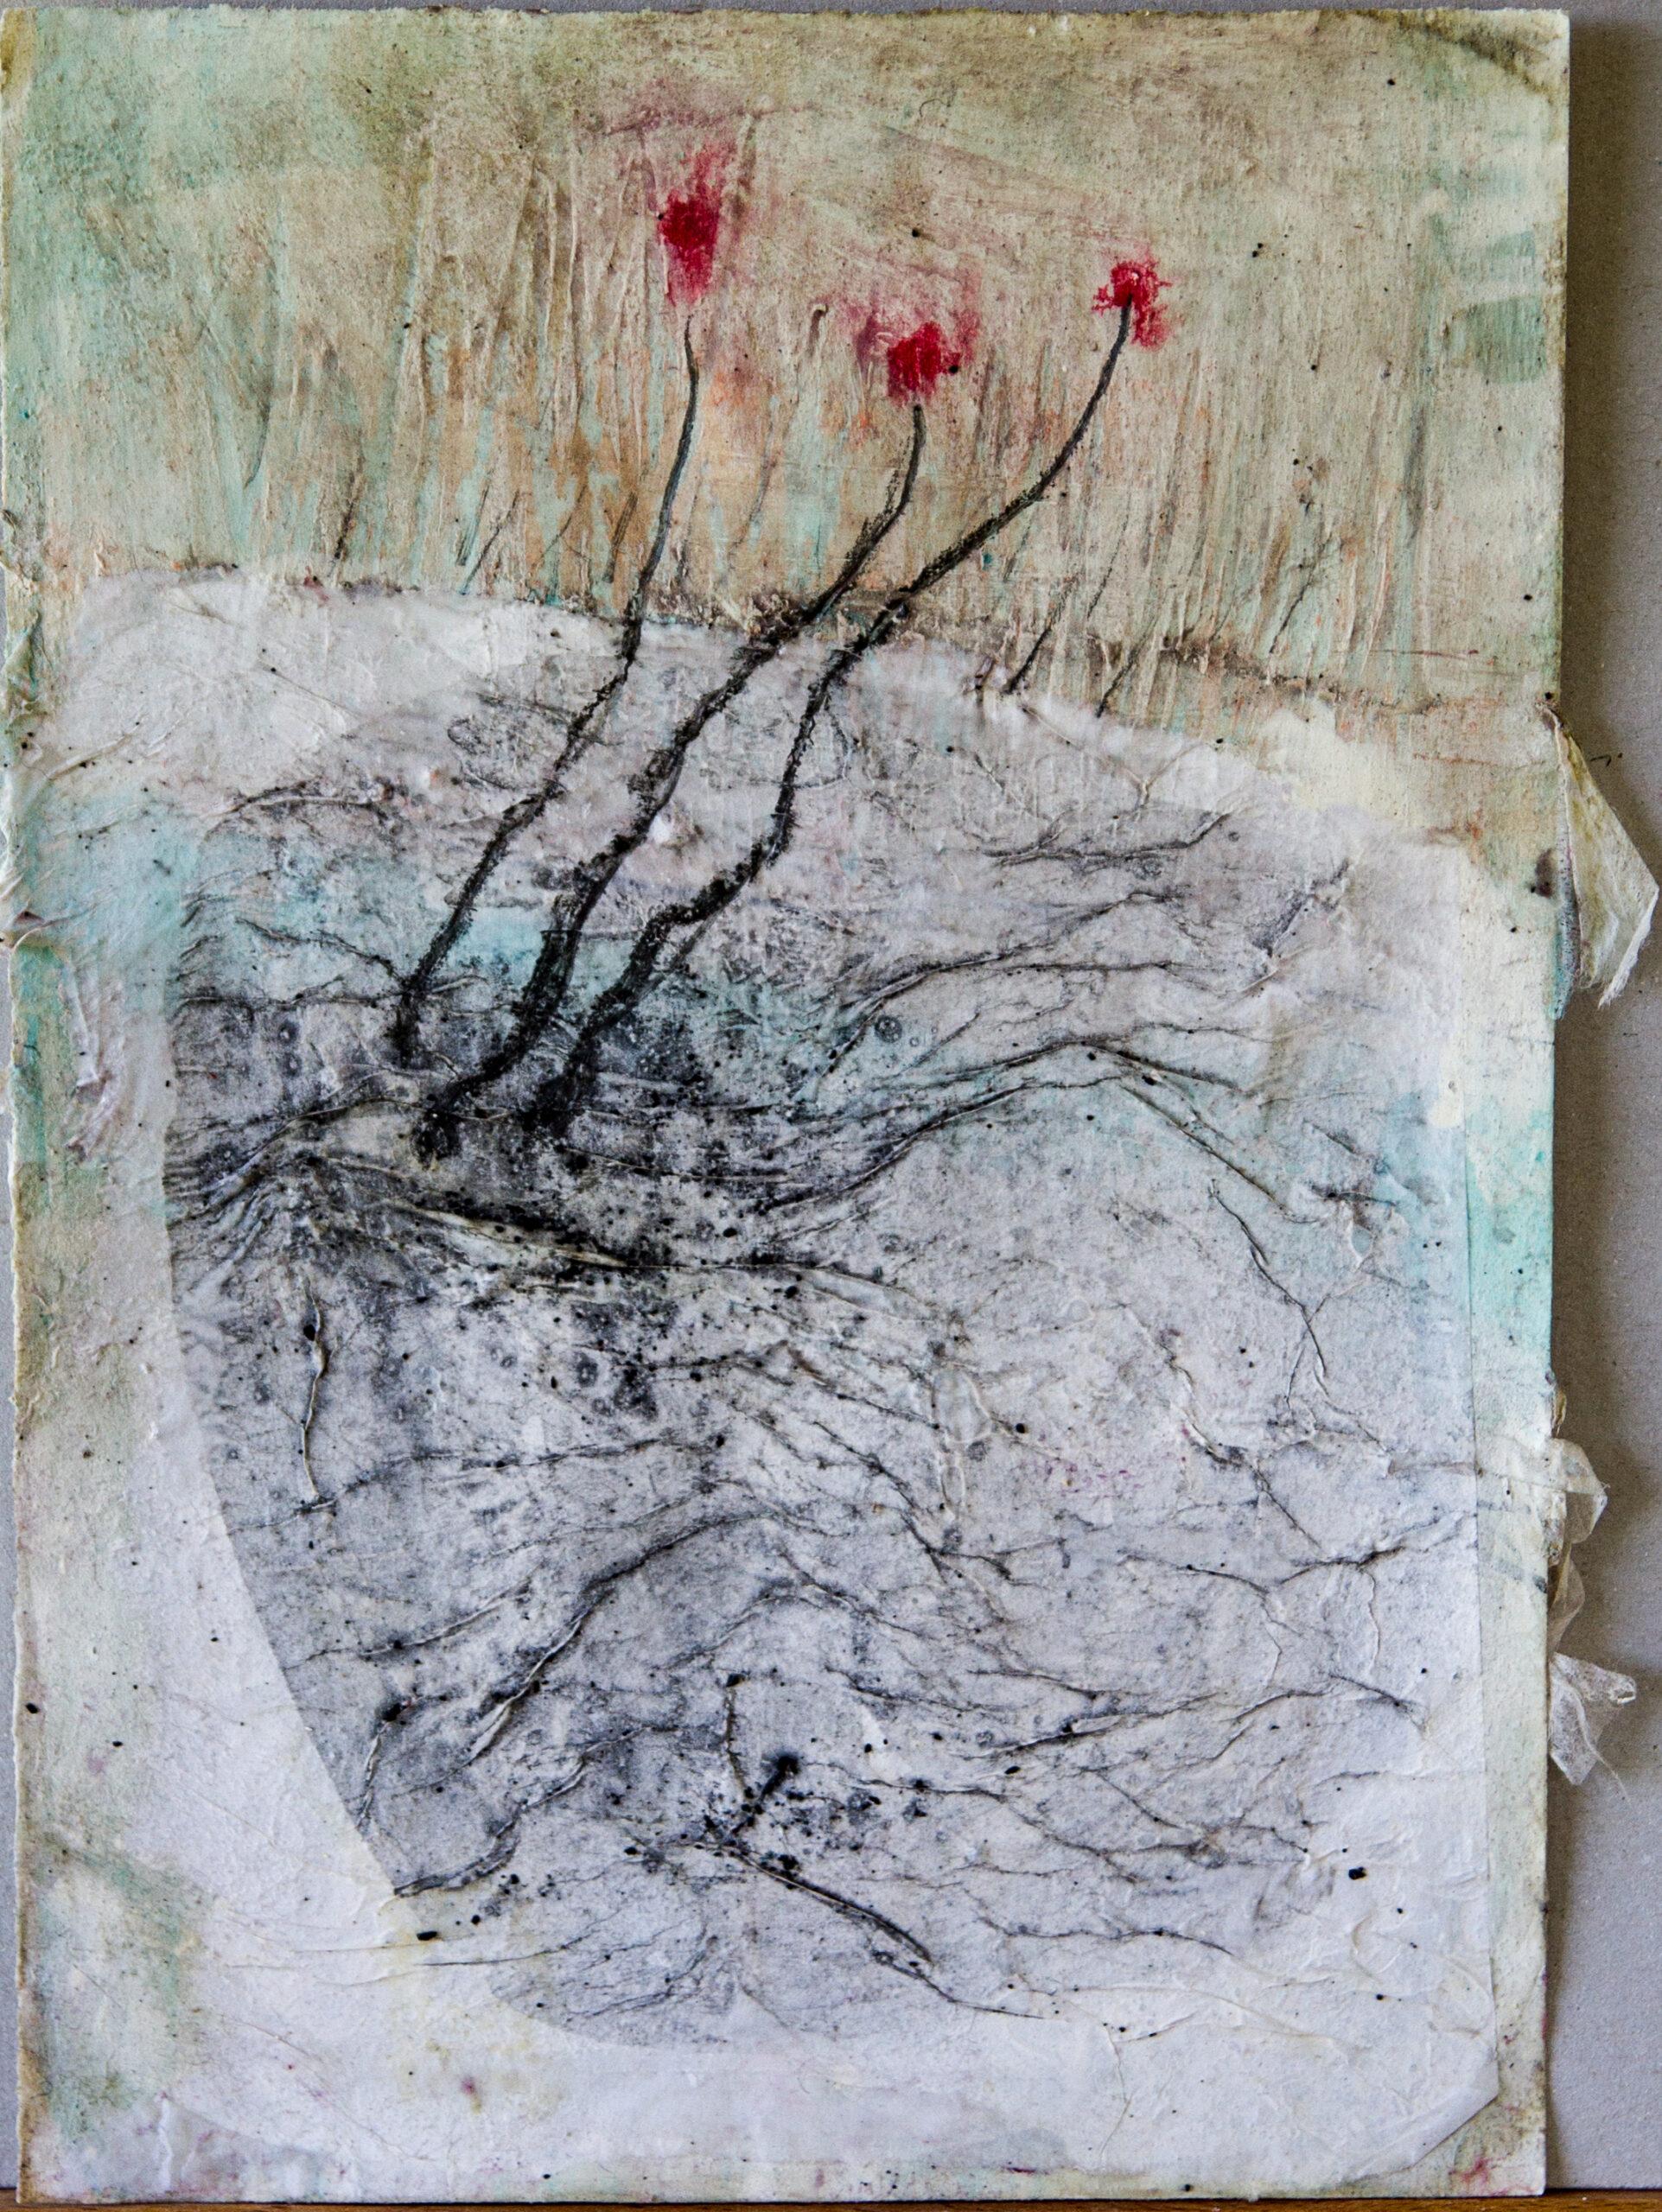 Blühen: 24x30,Acryl, Gesteinsmehle, Pigmente, Bleistift, Kreide, Papier auf Papier,2014